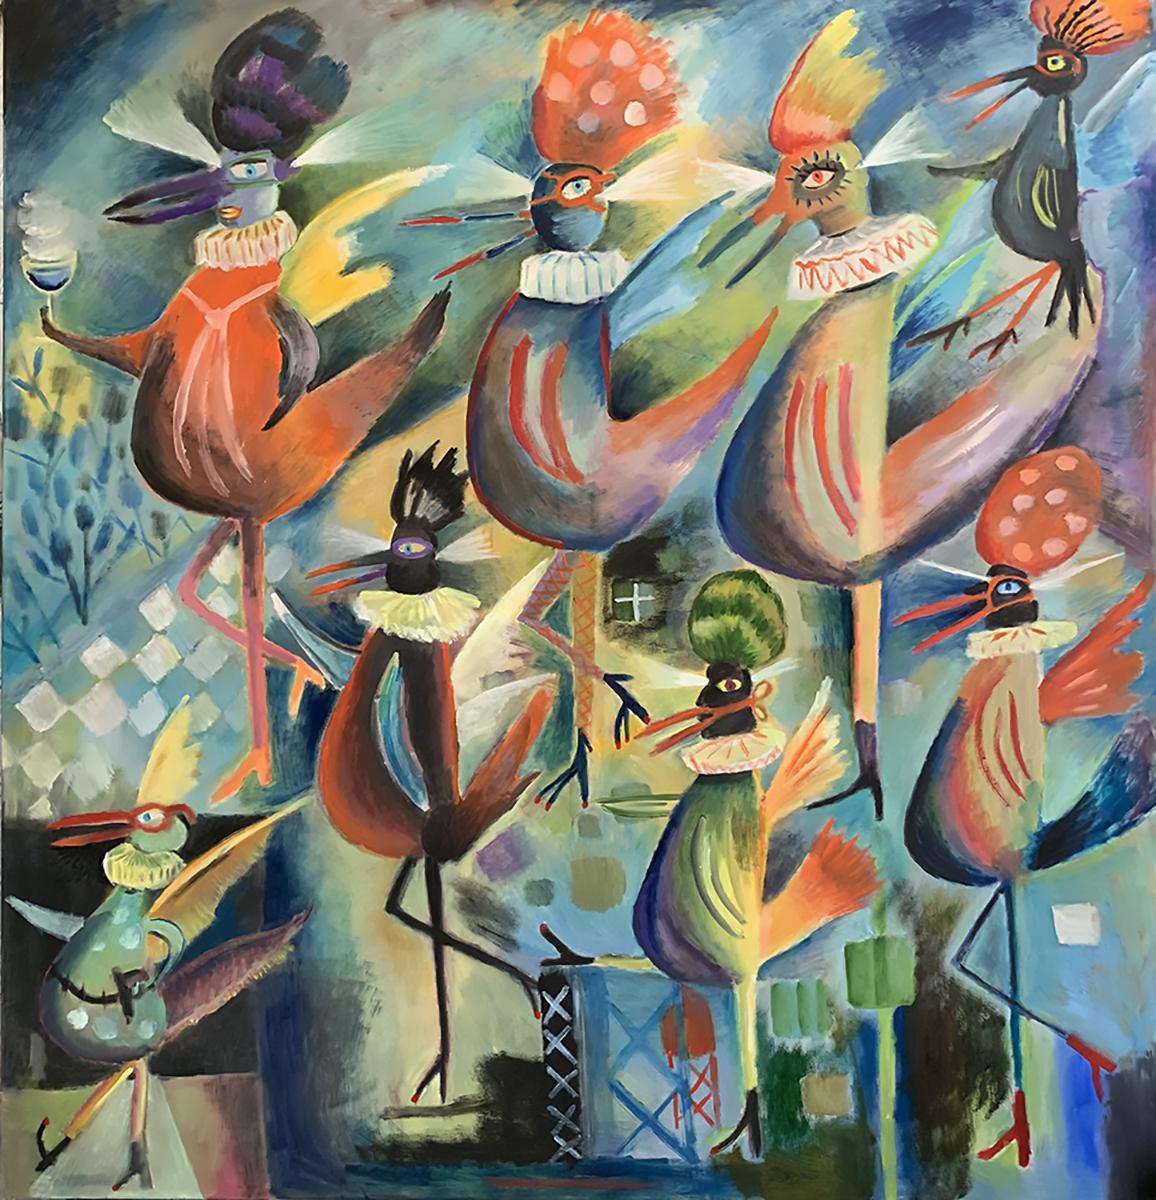 """Wild Birds"" by Santiago Cohen, oil on canvas, 58x52, courtesy Pro Arts"